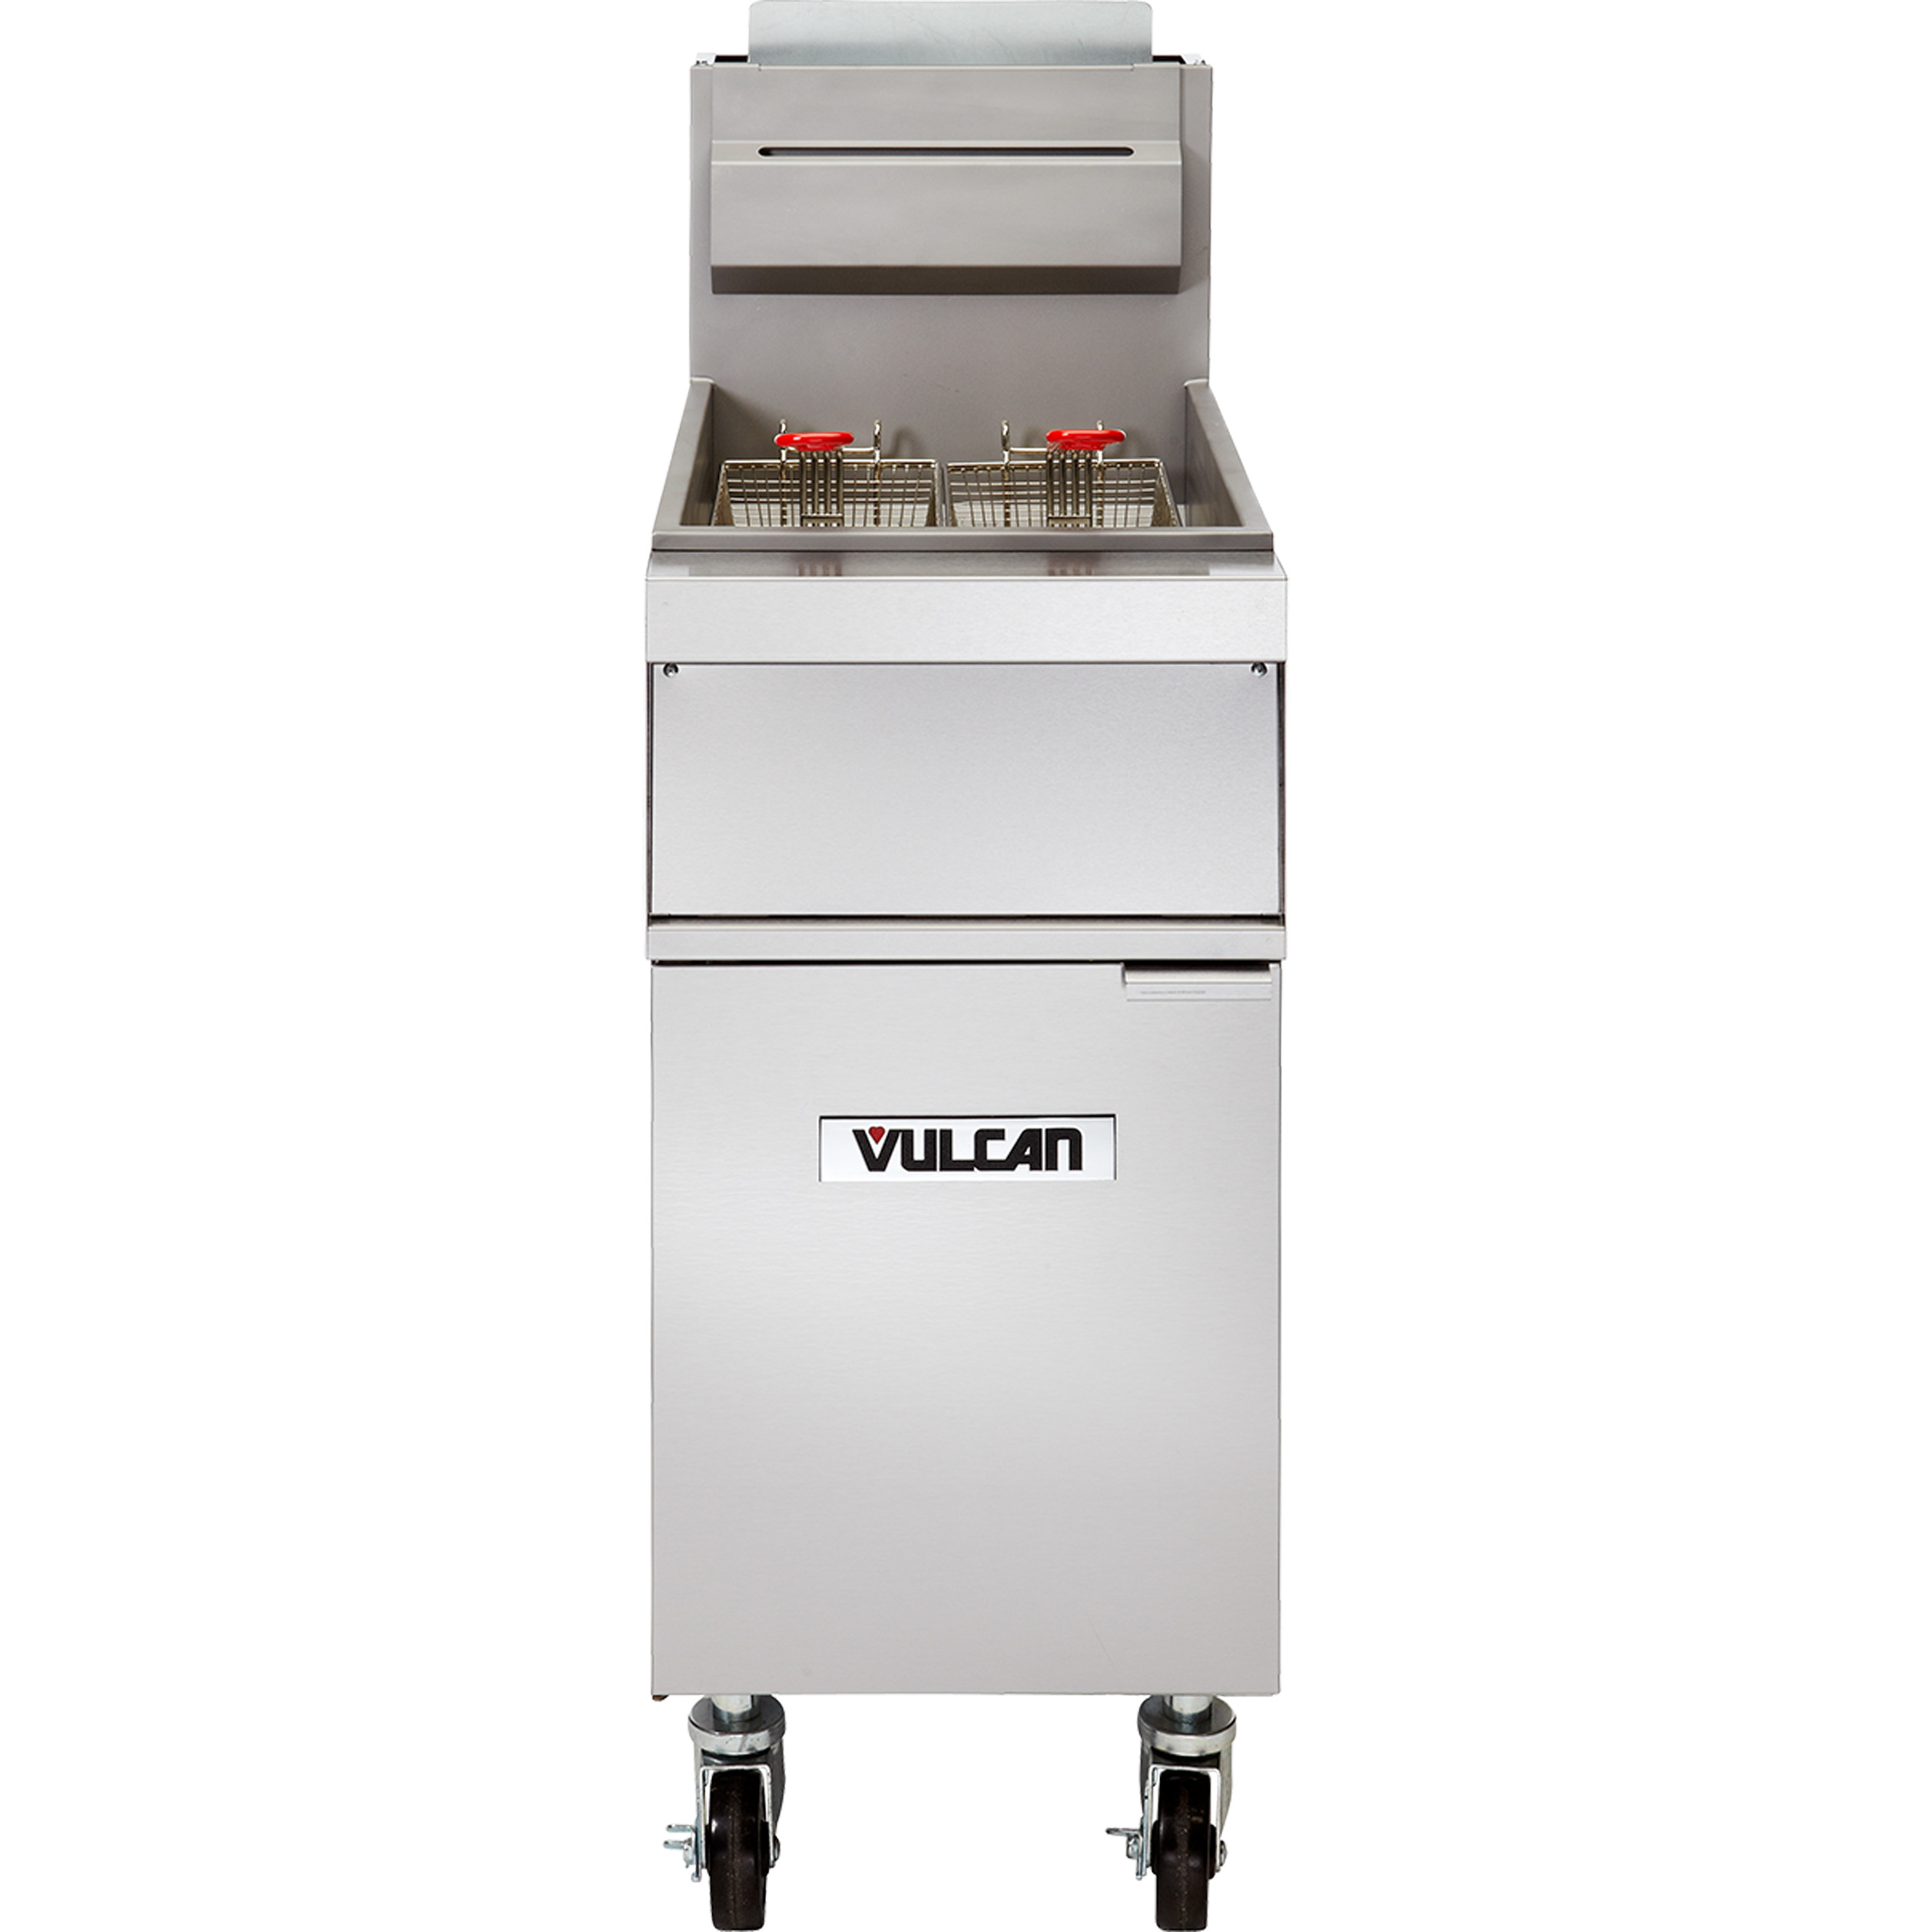 Vulcan 1GR45M fryer, gas, floor model, full pot